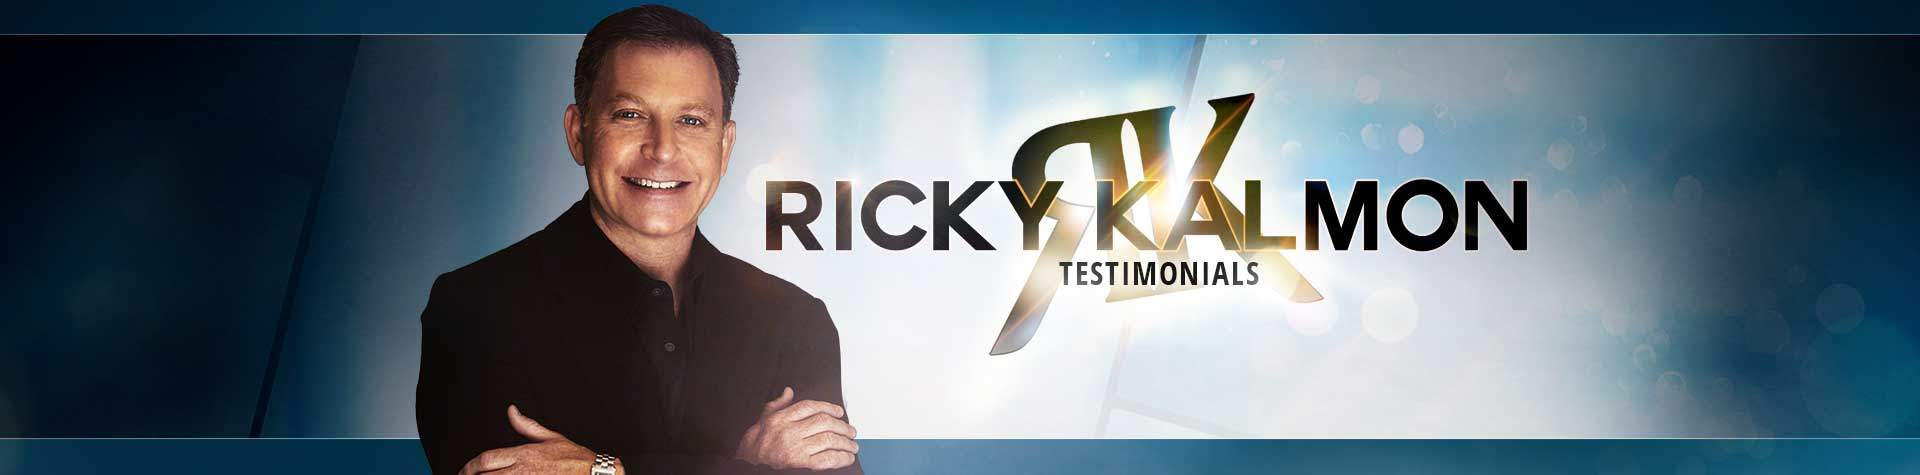 Ricky Kalmon Testimonials